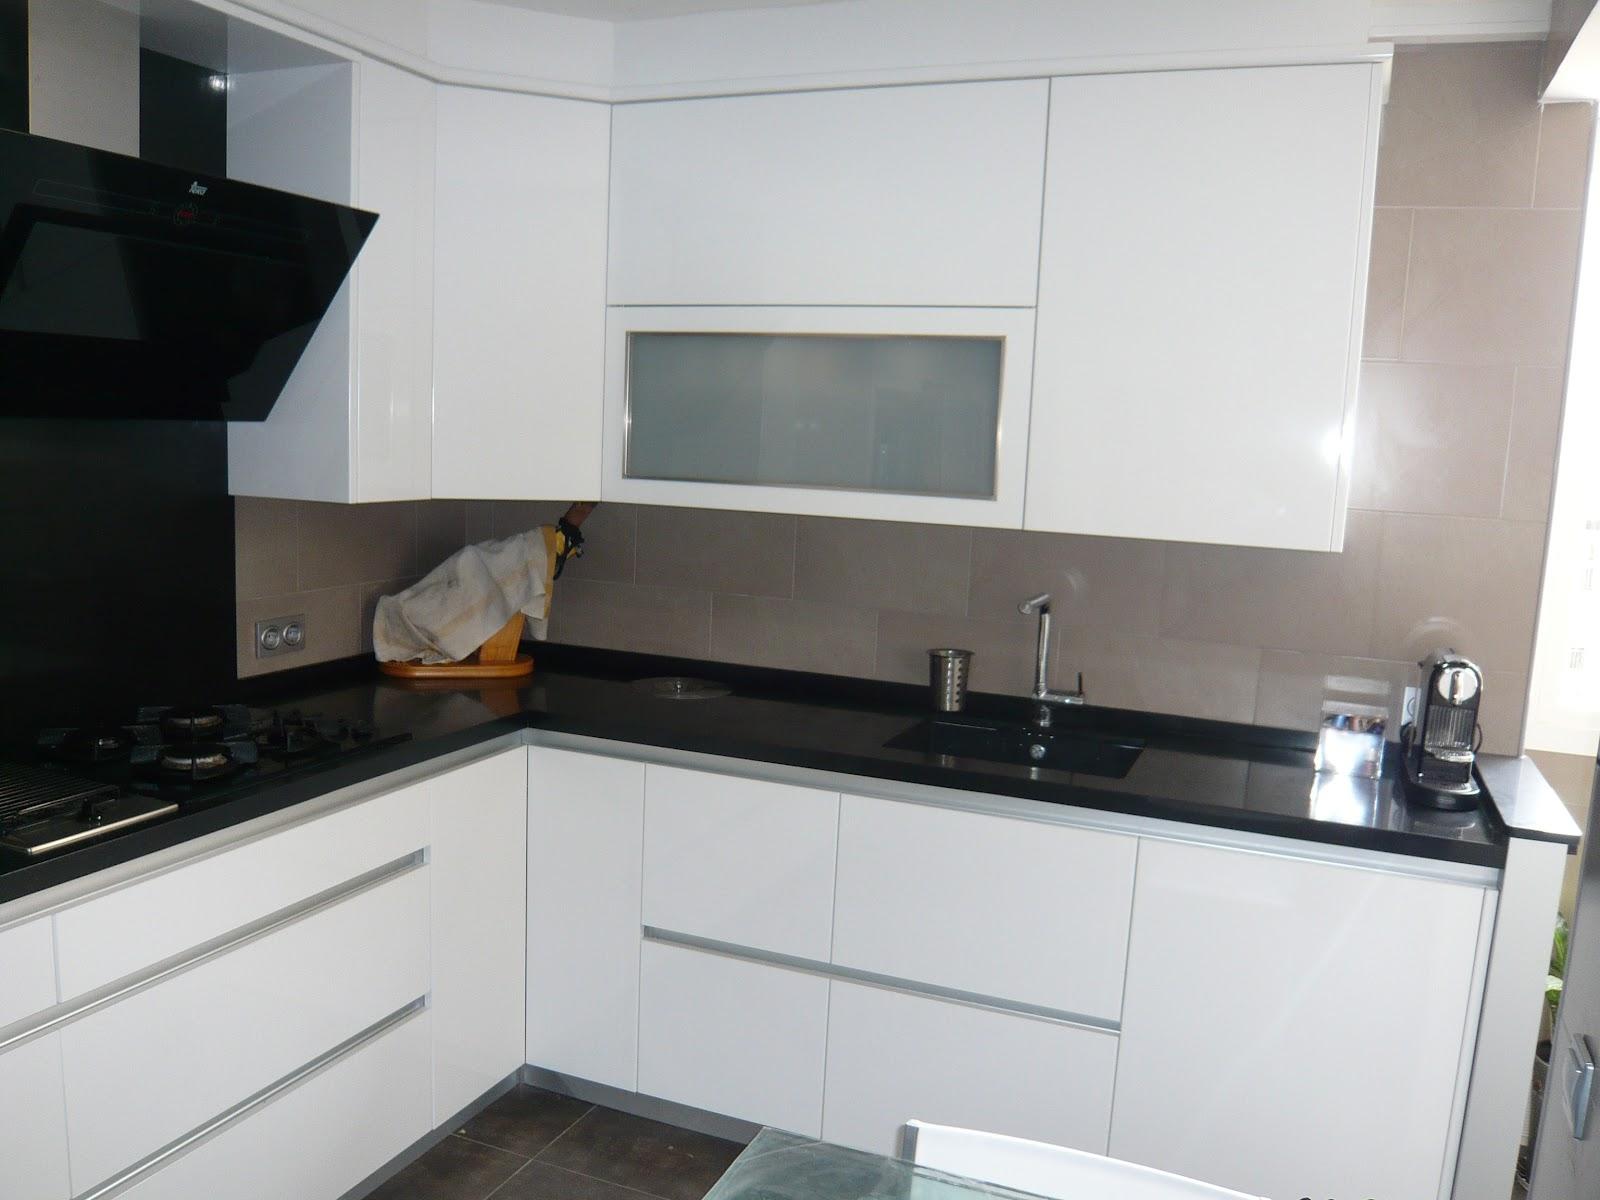 Reuscuina muebles de cocina blanco brillo sin tiradores - Muebles cocina blanco ...